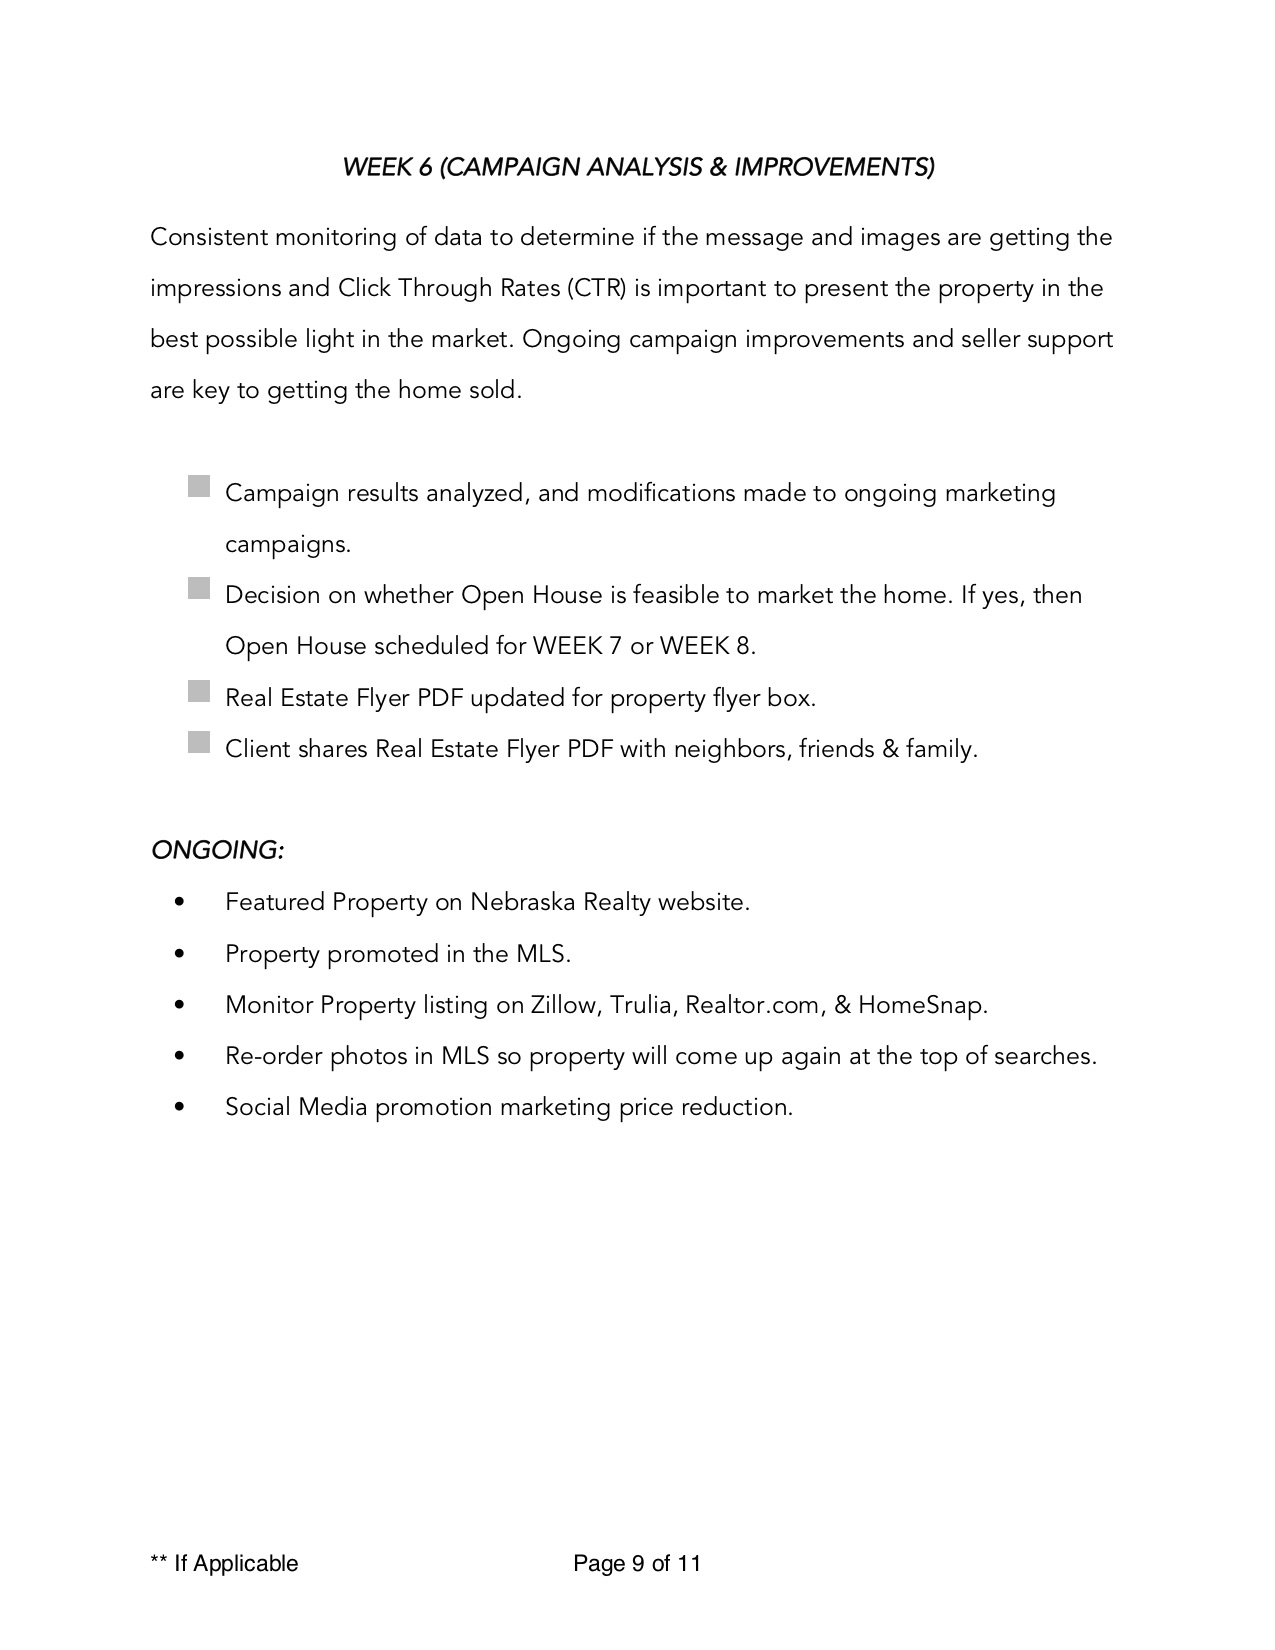 8 Week Marketing Plan9.jpg